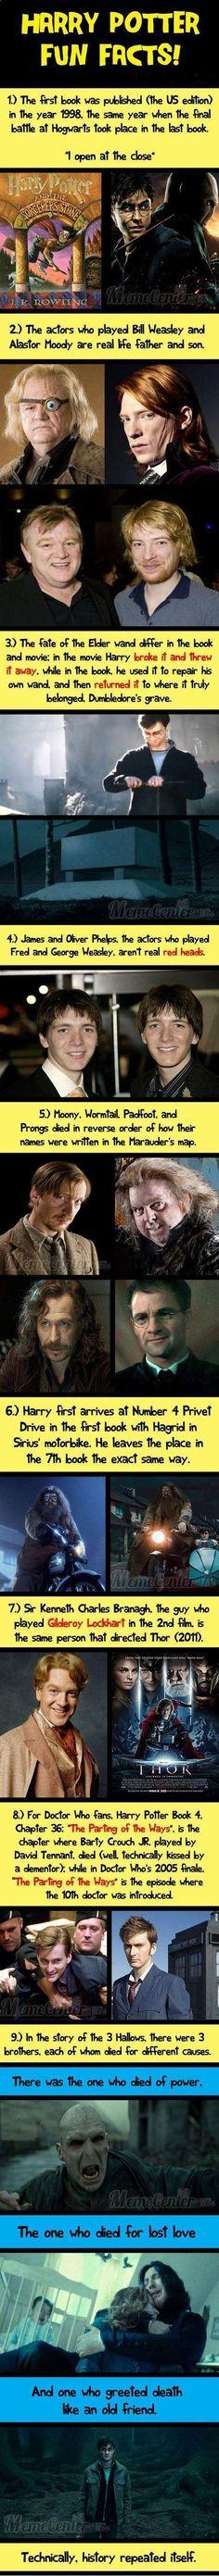 geek, harri potter, nerd, fun fact, stuff, book, potter fun, movi, harry potter